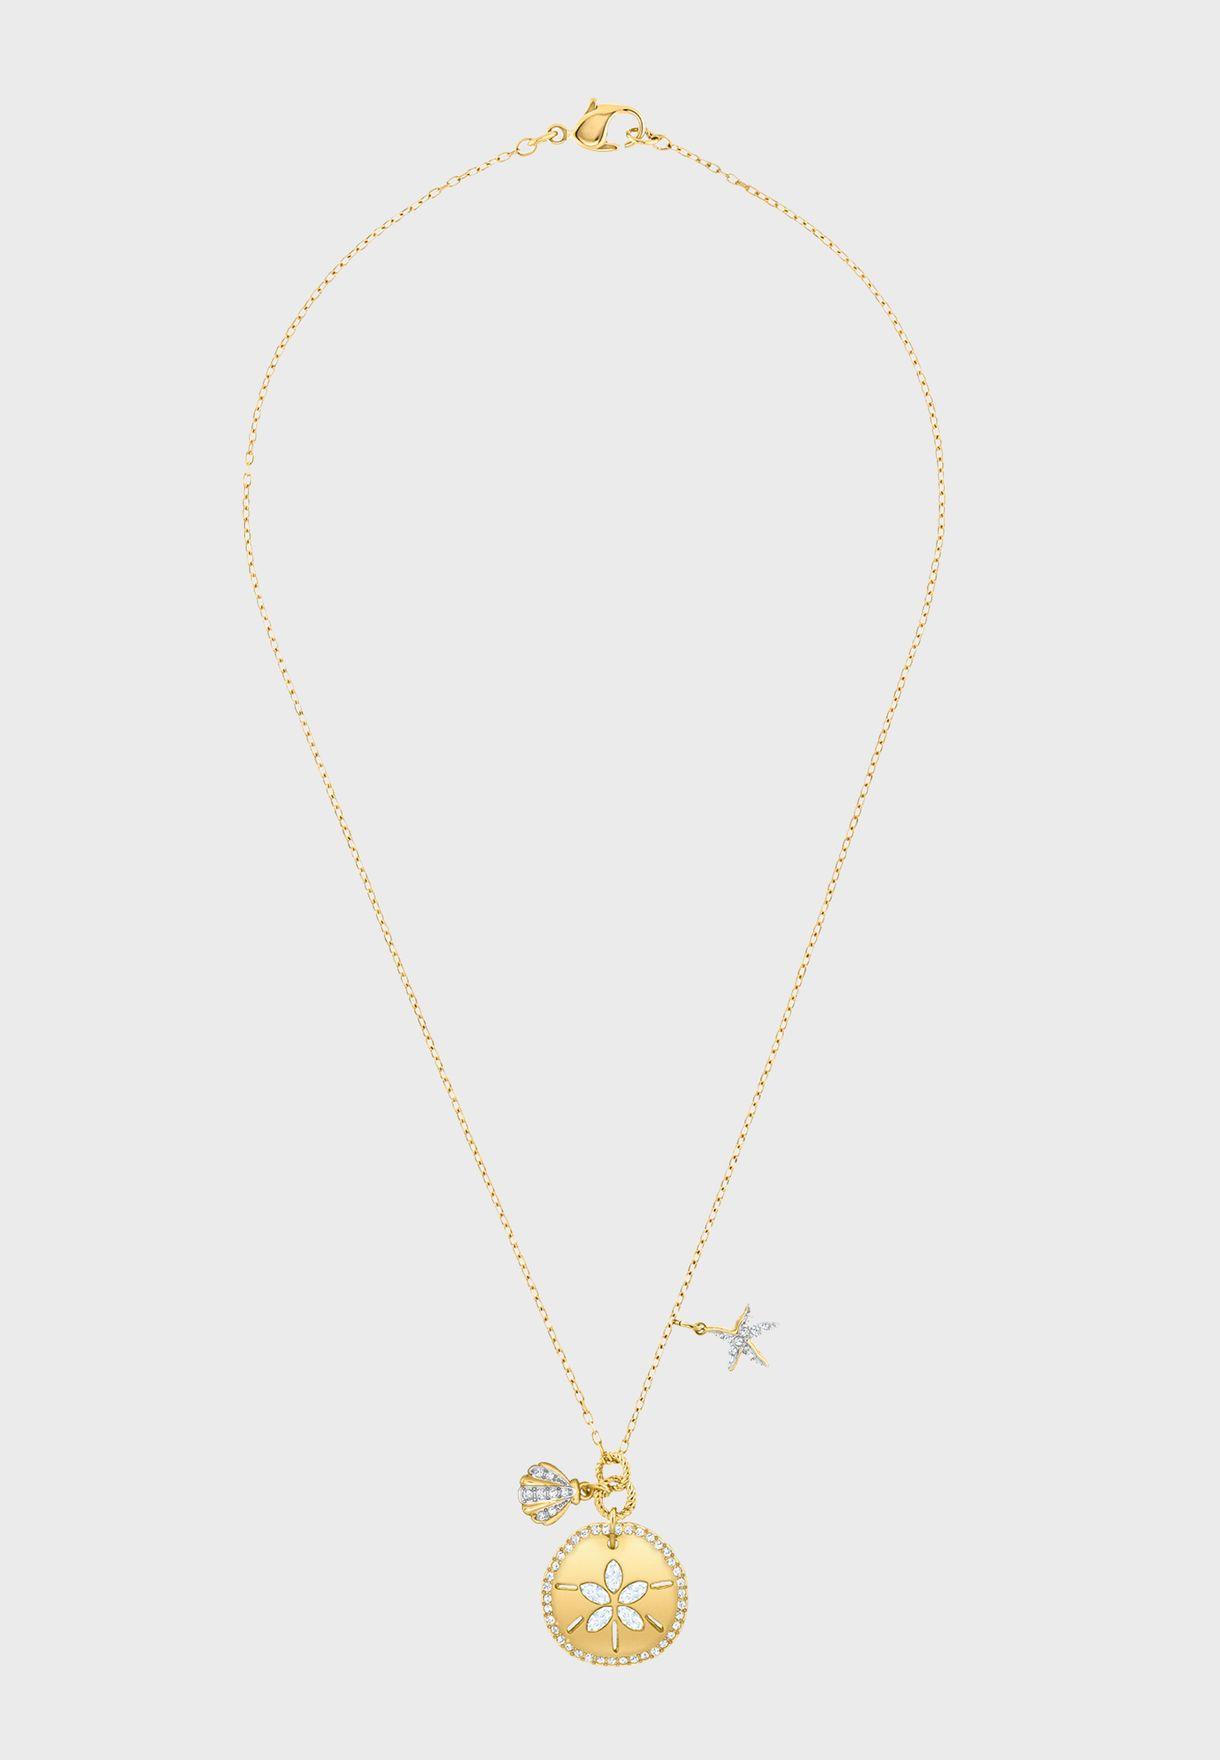 Ocean Sand Coin Necklace